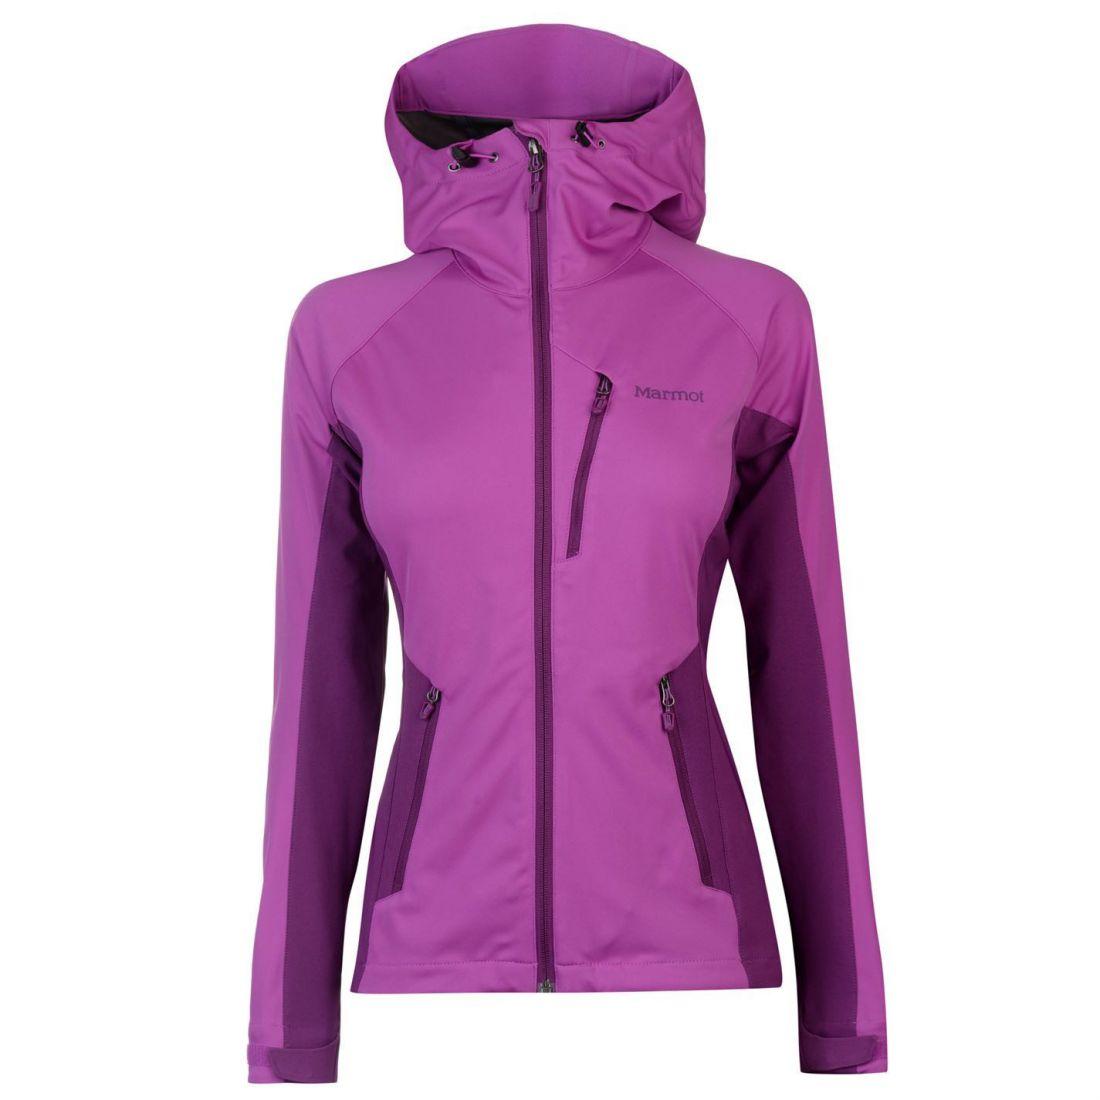 66905074 Marmot Womens ROM Jacket Waterproof Coat Top Windproof Water Resistant